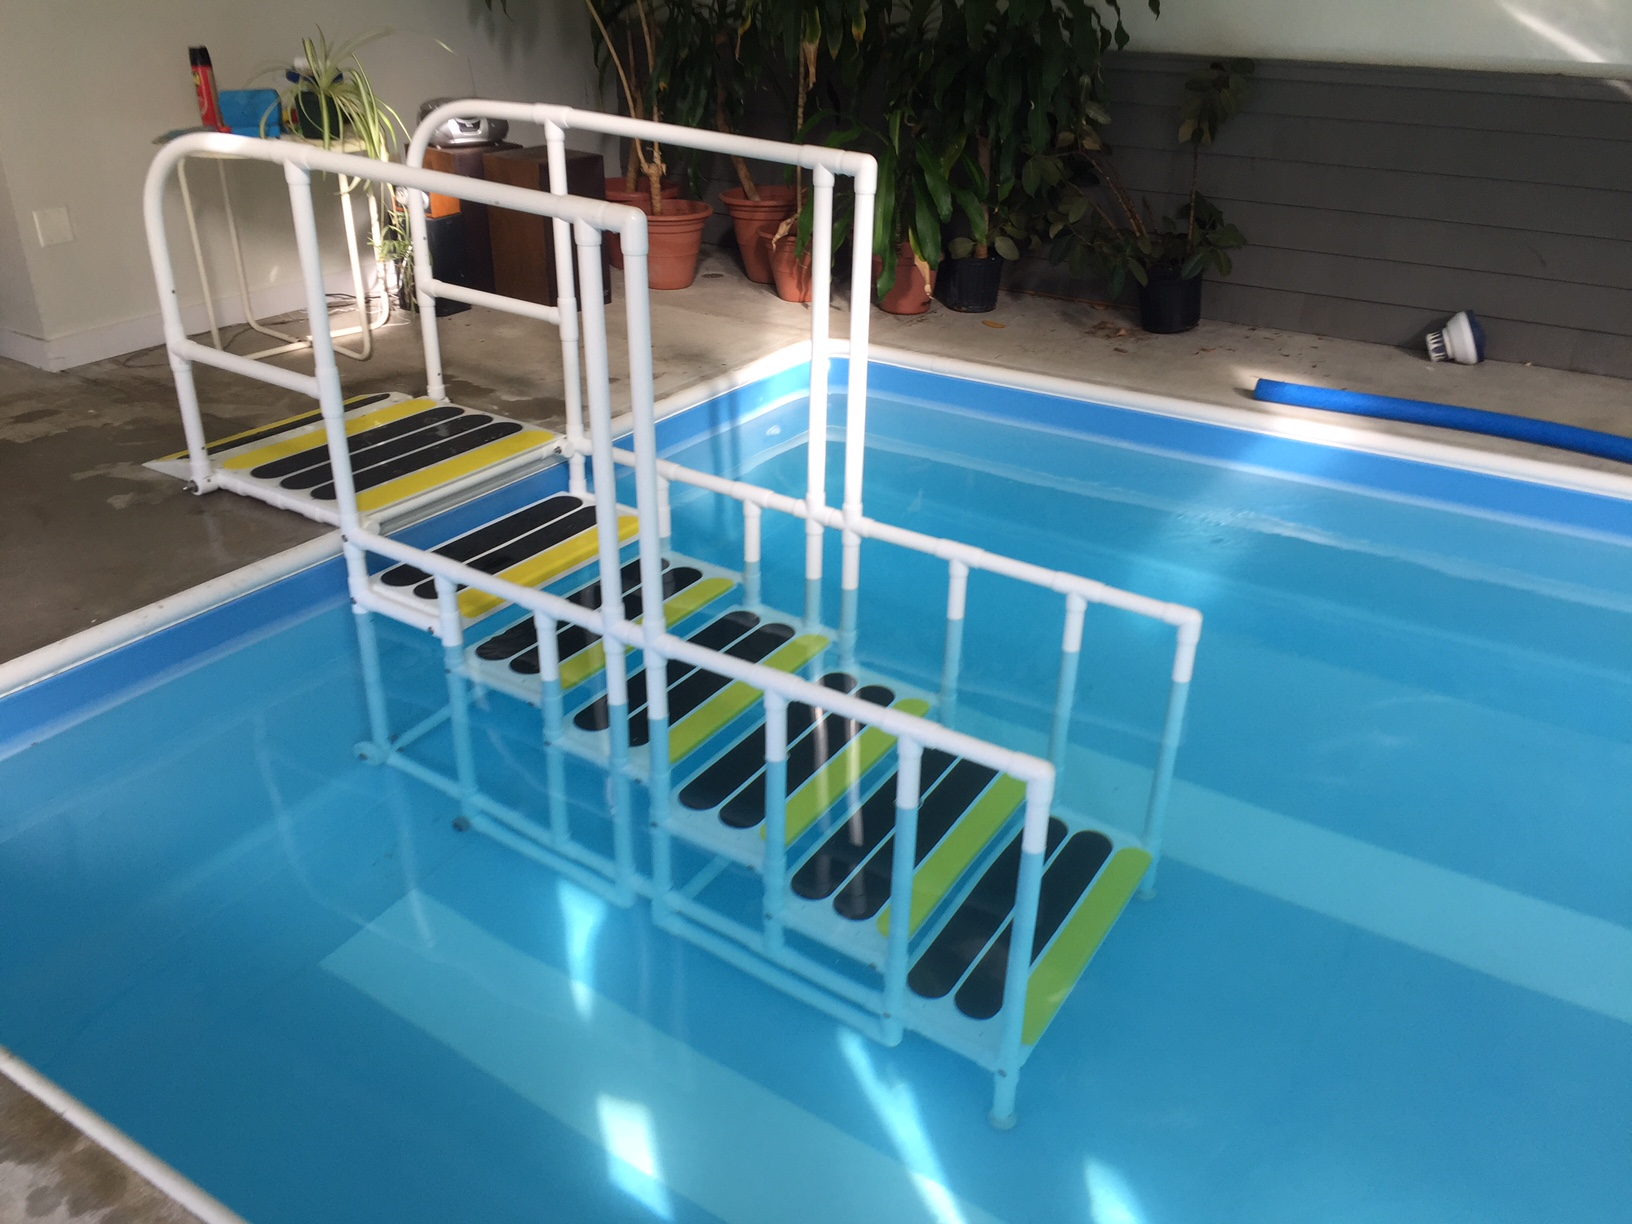 Aquatrek2 Non Slip Forward Walking Pool Ladder System